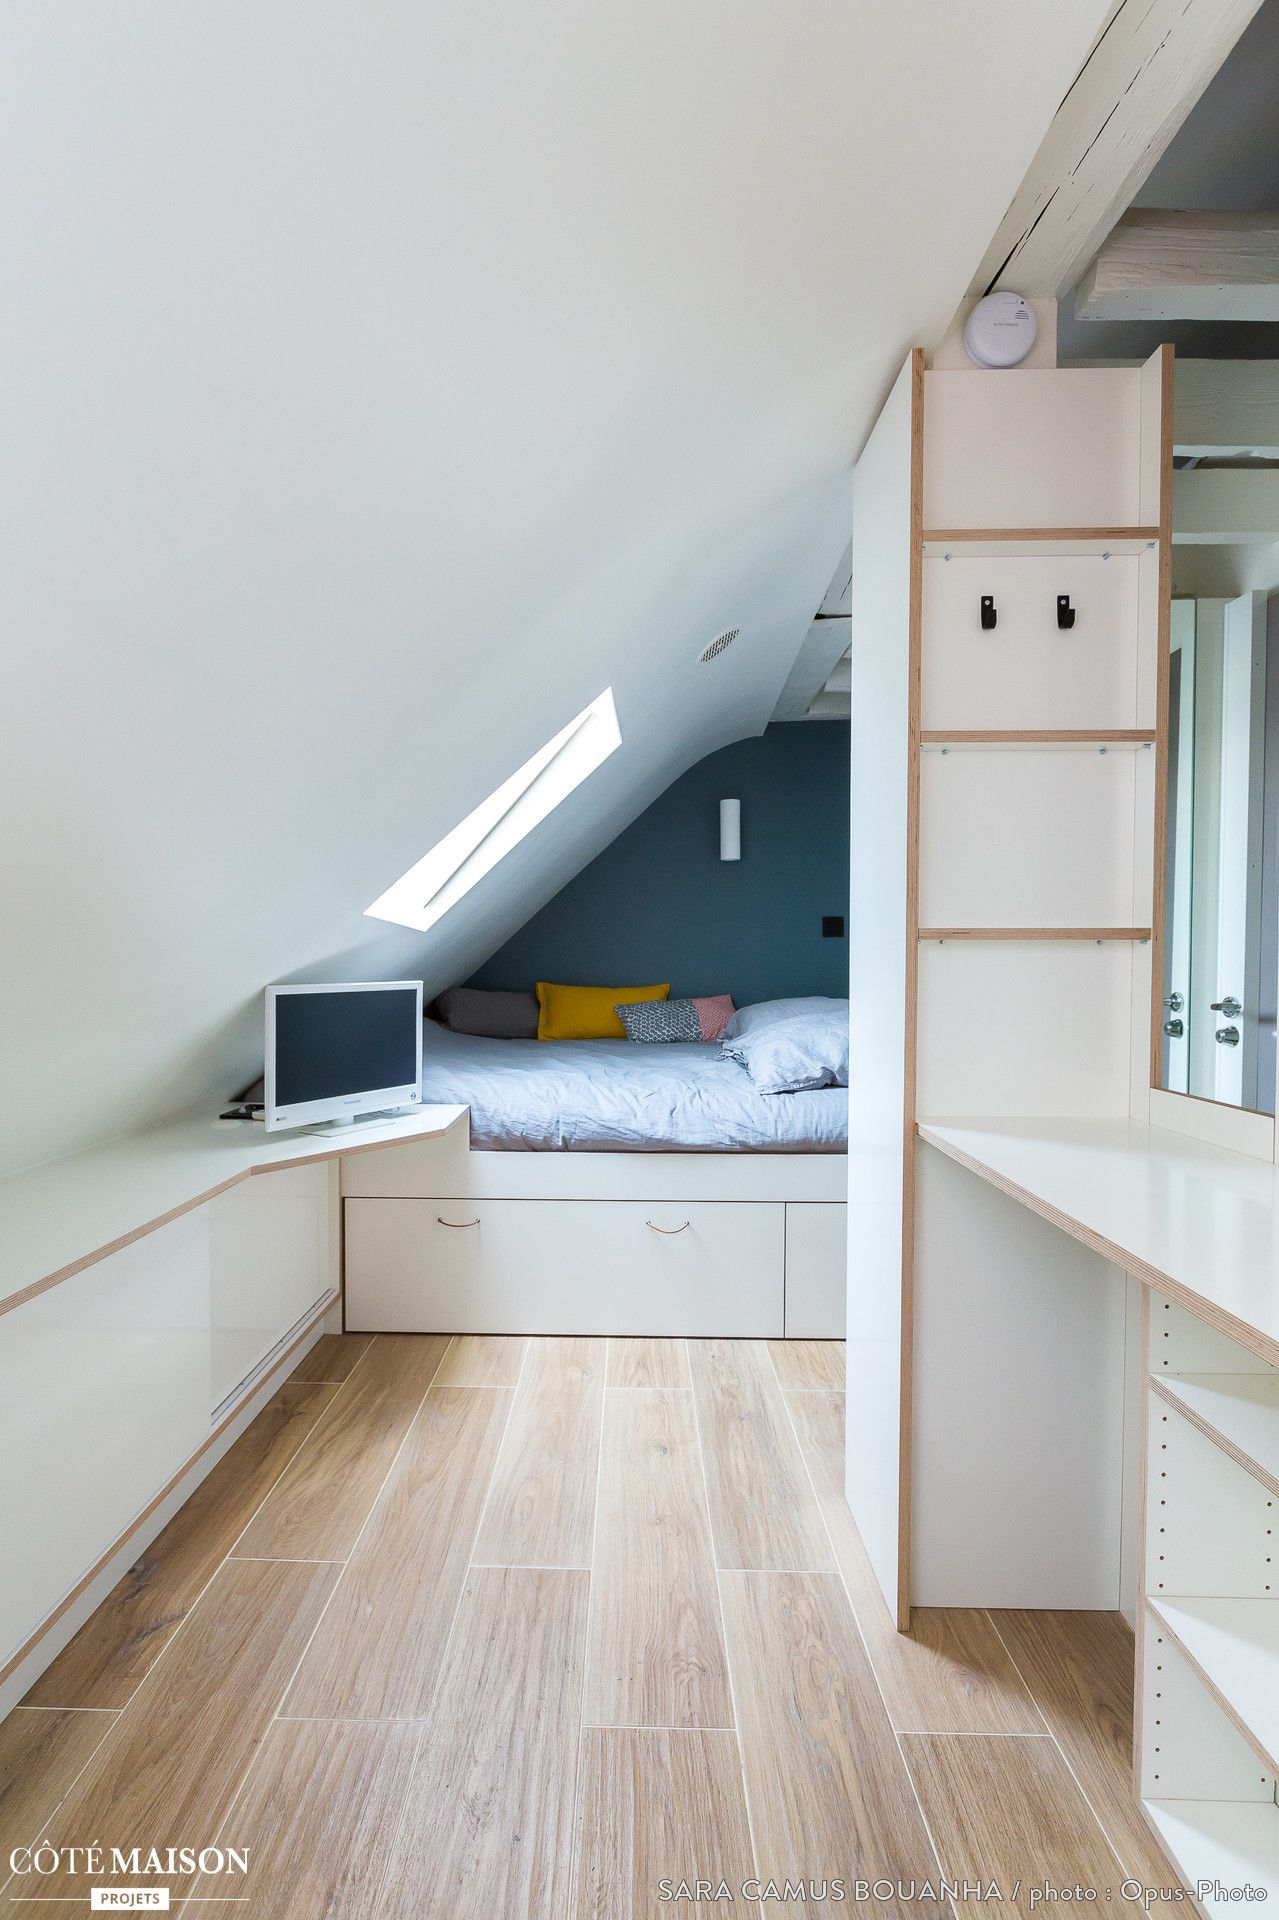 Chambre Sous Les Combles Under Roof Bedroom Wohnung Wohnen Neue Wohnung